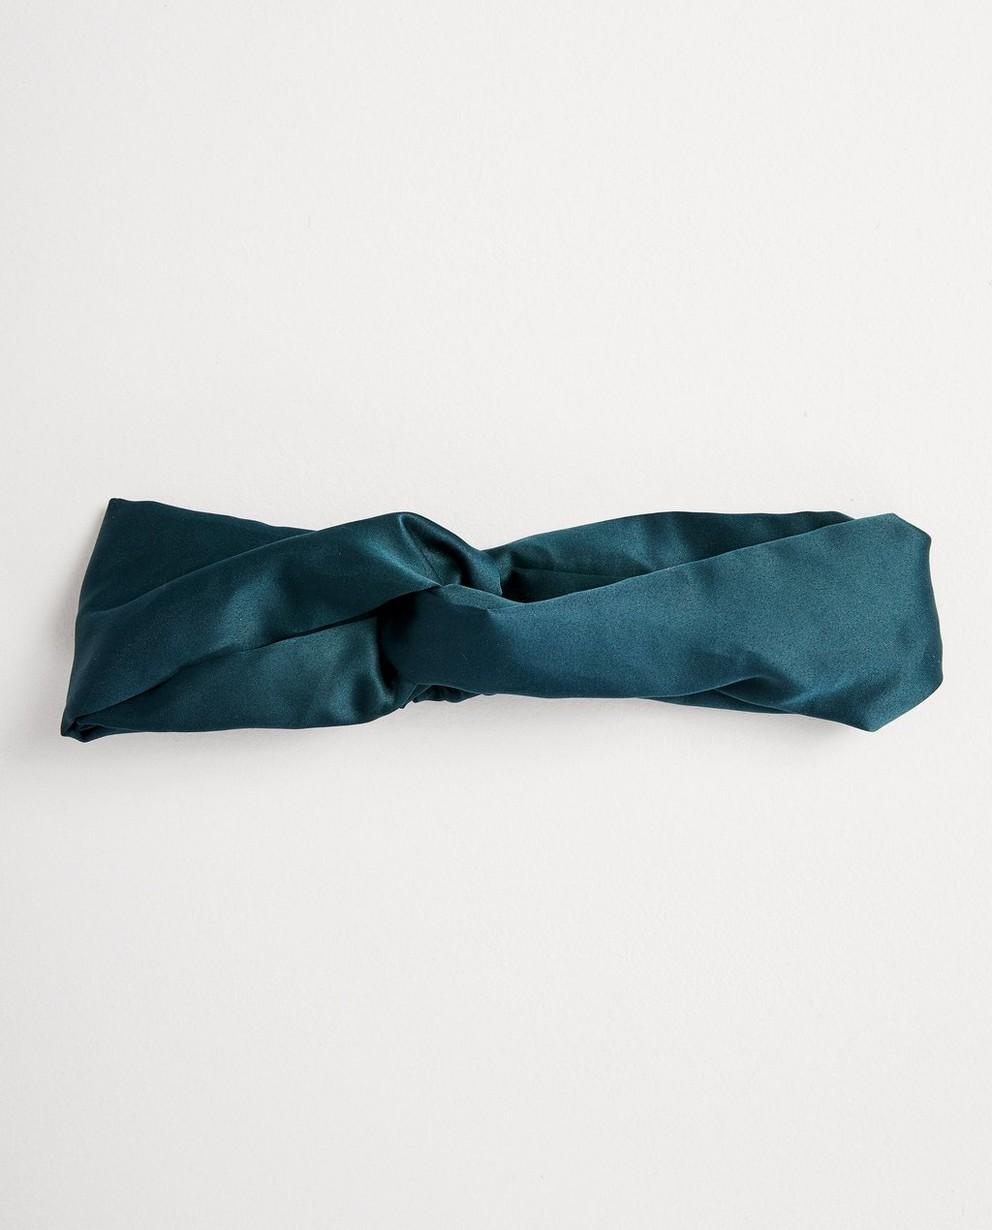 Grünes Haarband - gekreuzt - JBC